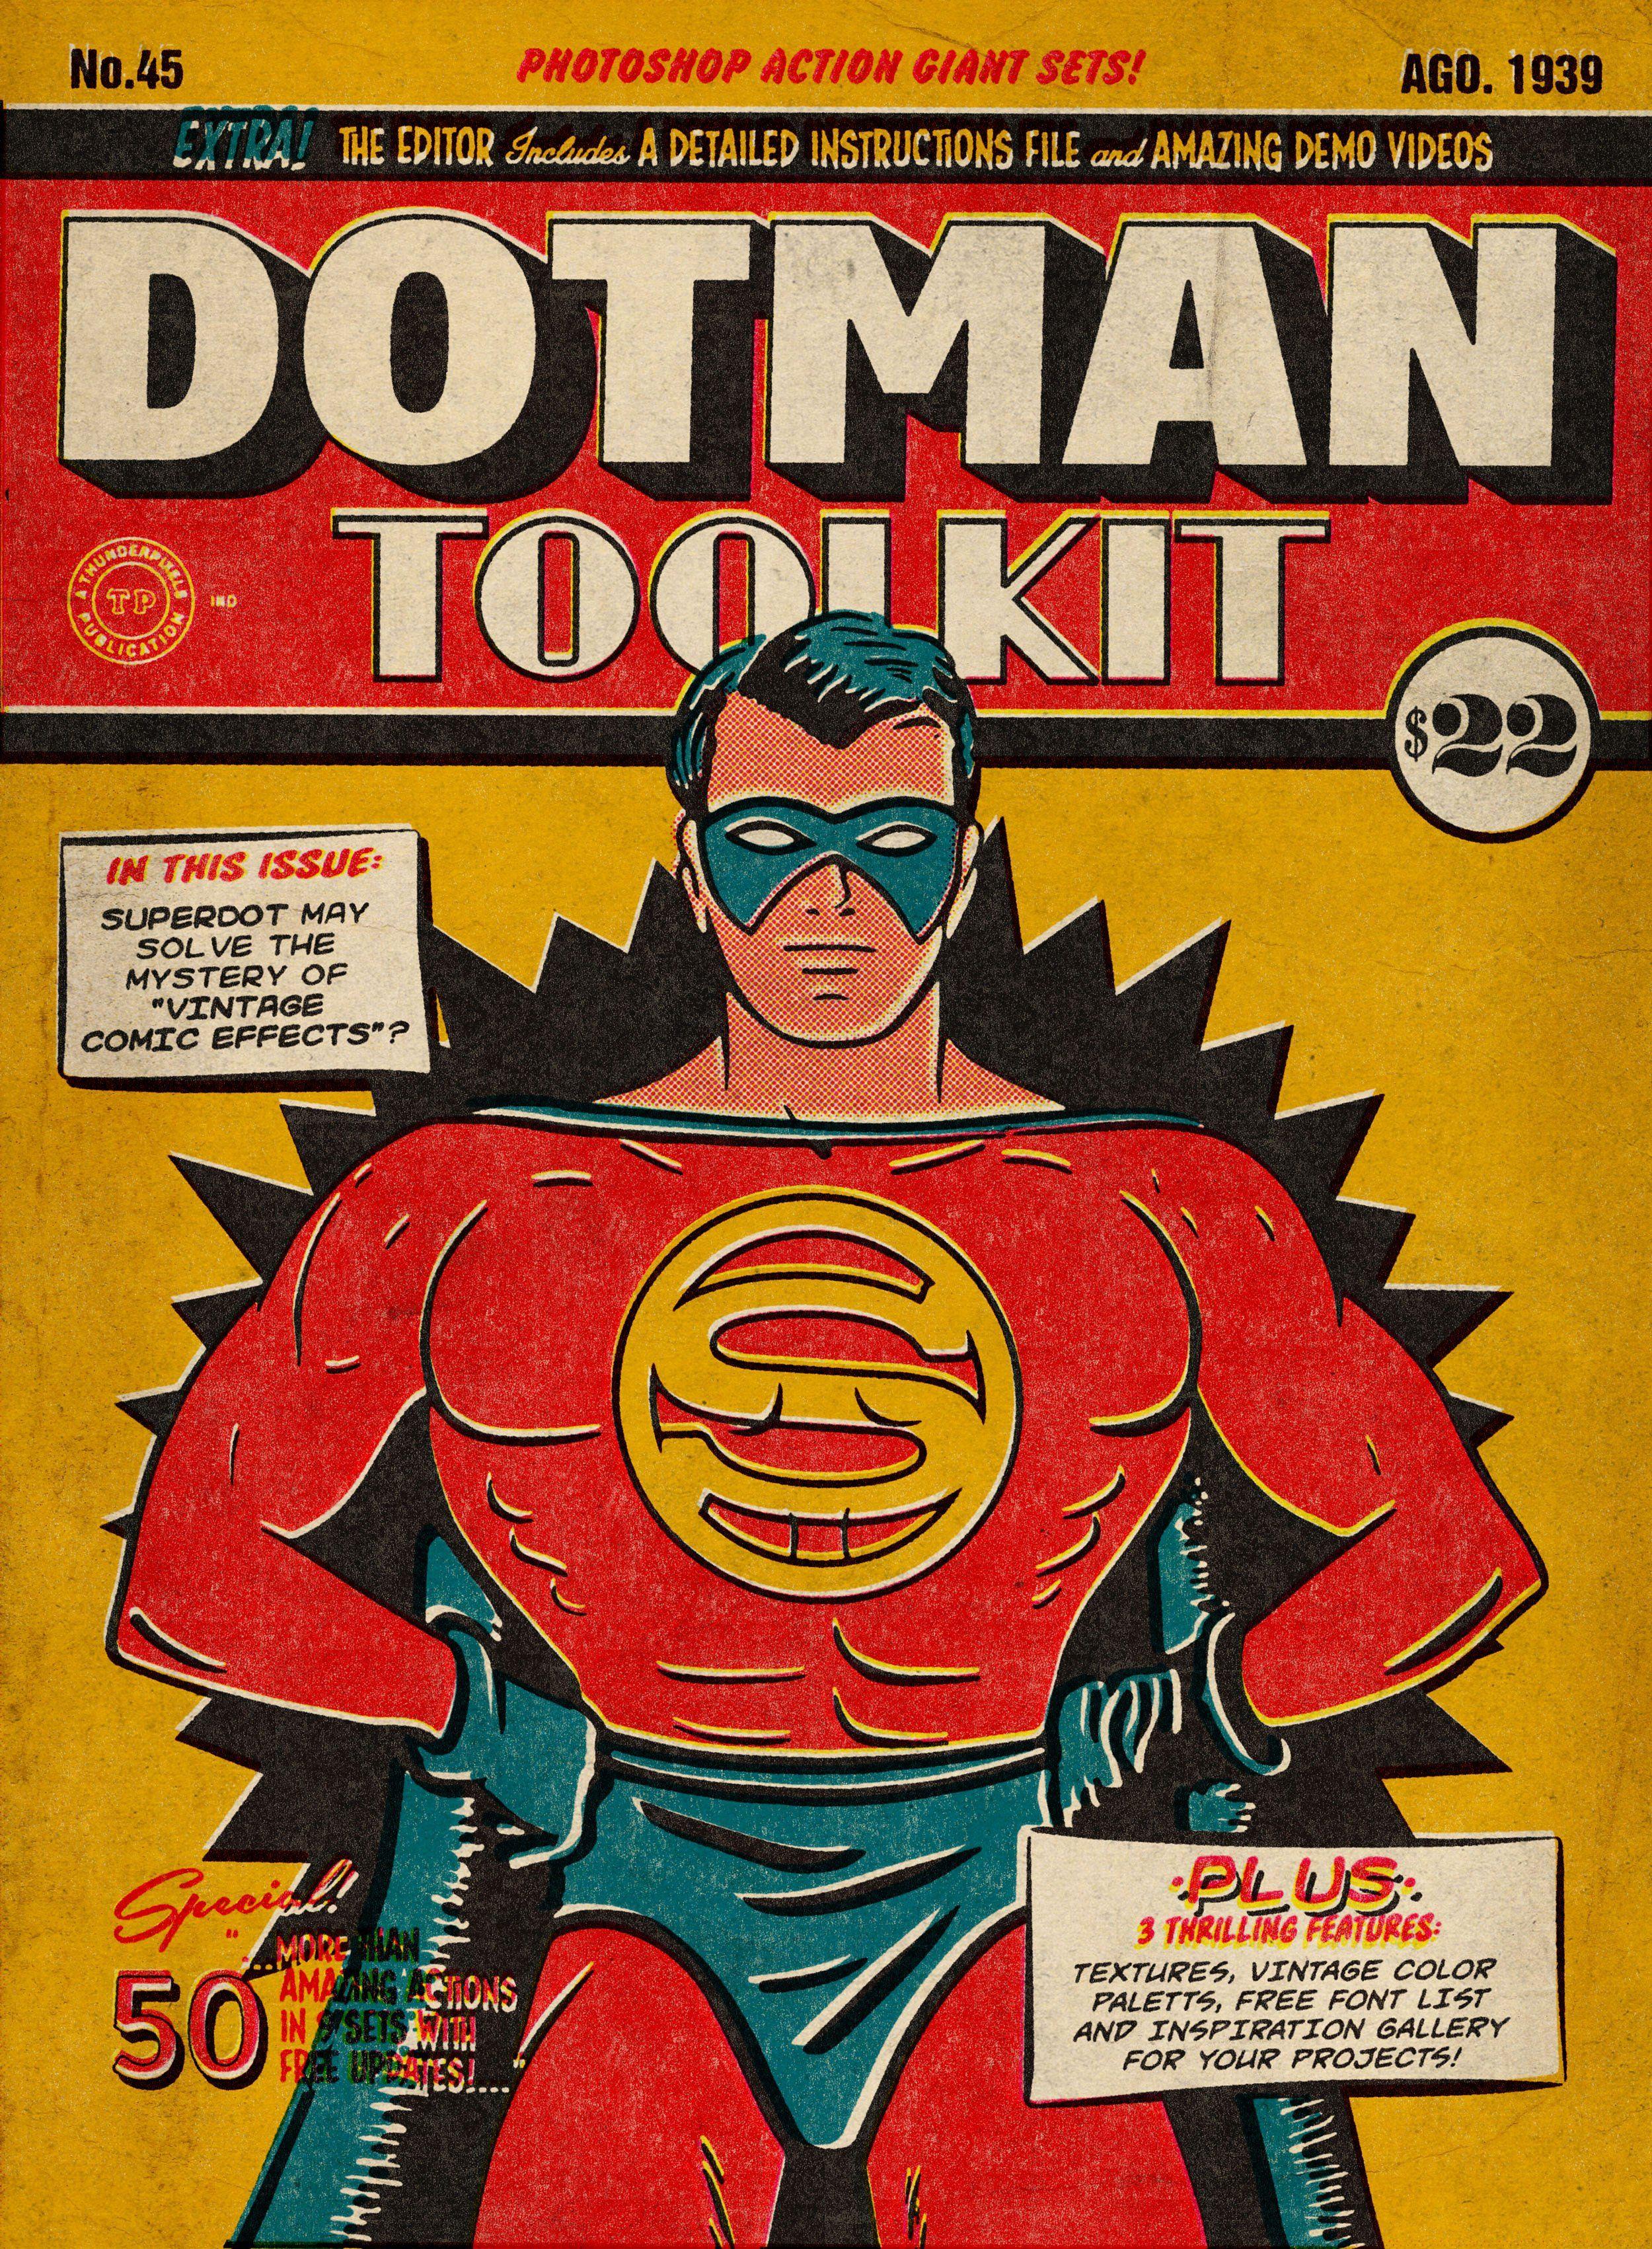 Dotman Toolkit Vintage Comic Effects Vintage Comics Vintage Comic Books Old Comic Books